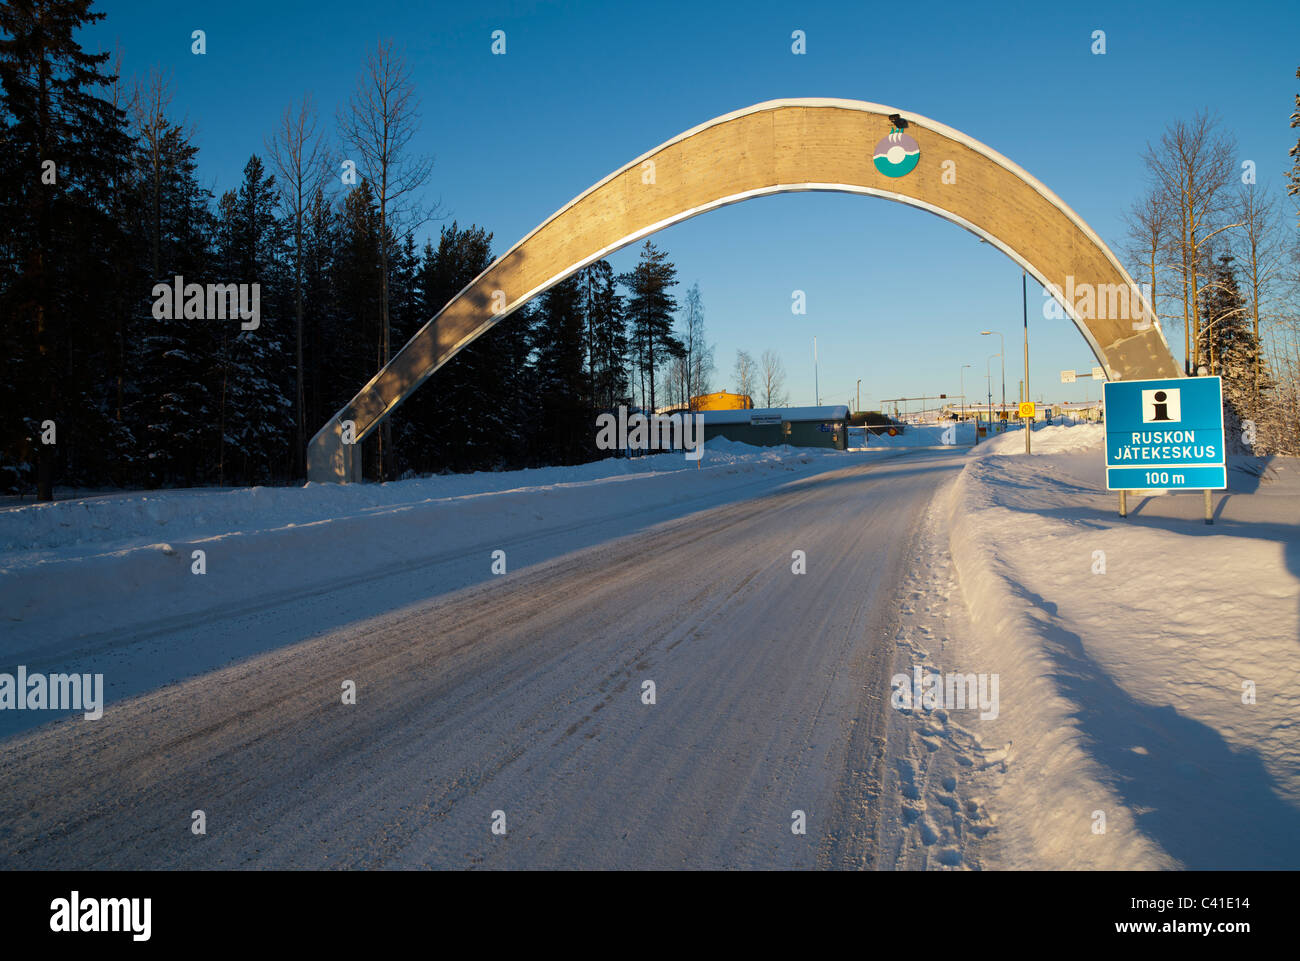 Gateway to the Rusko garbage dump / landfill ( Ruskon jätekeskus ) , Oulu , Finland - Stock Image